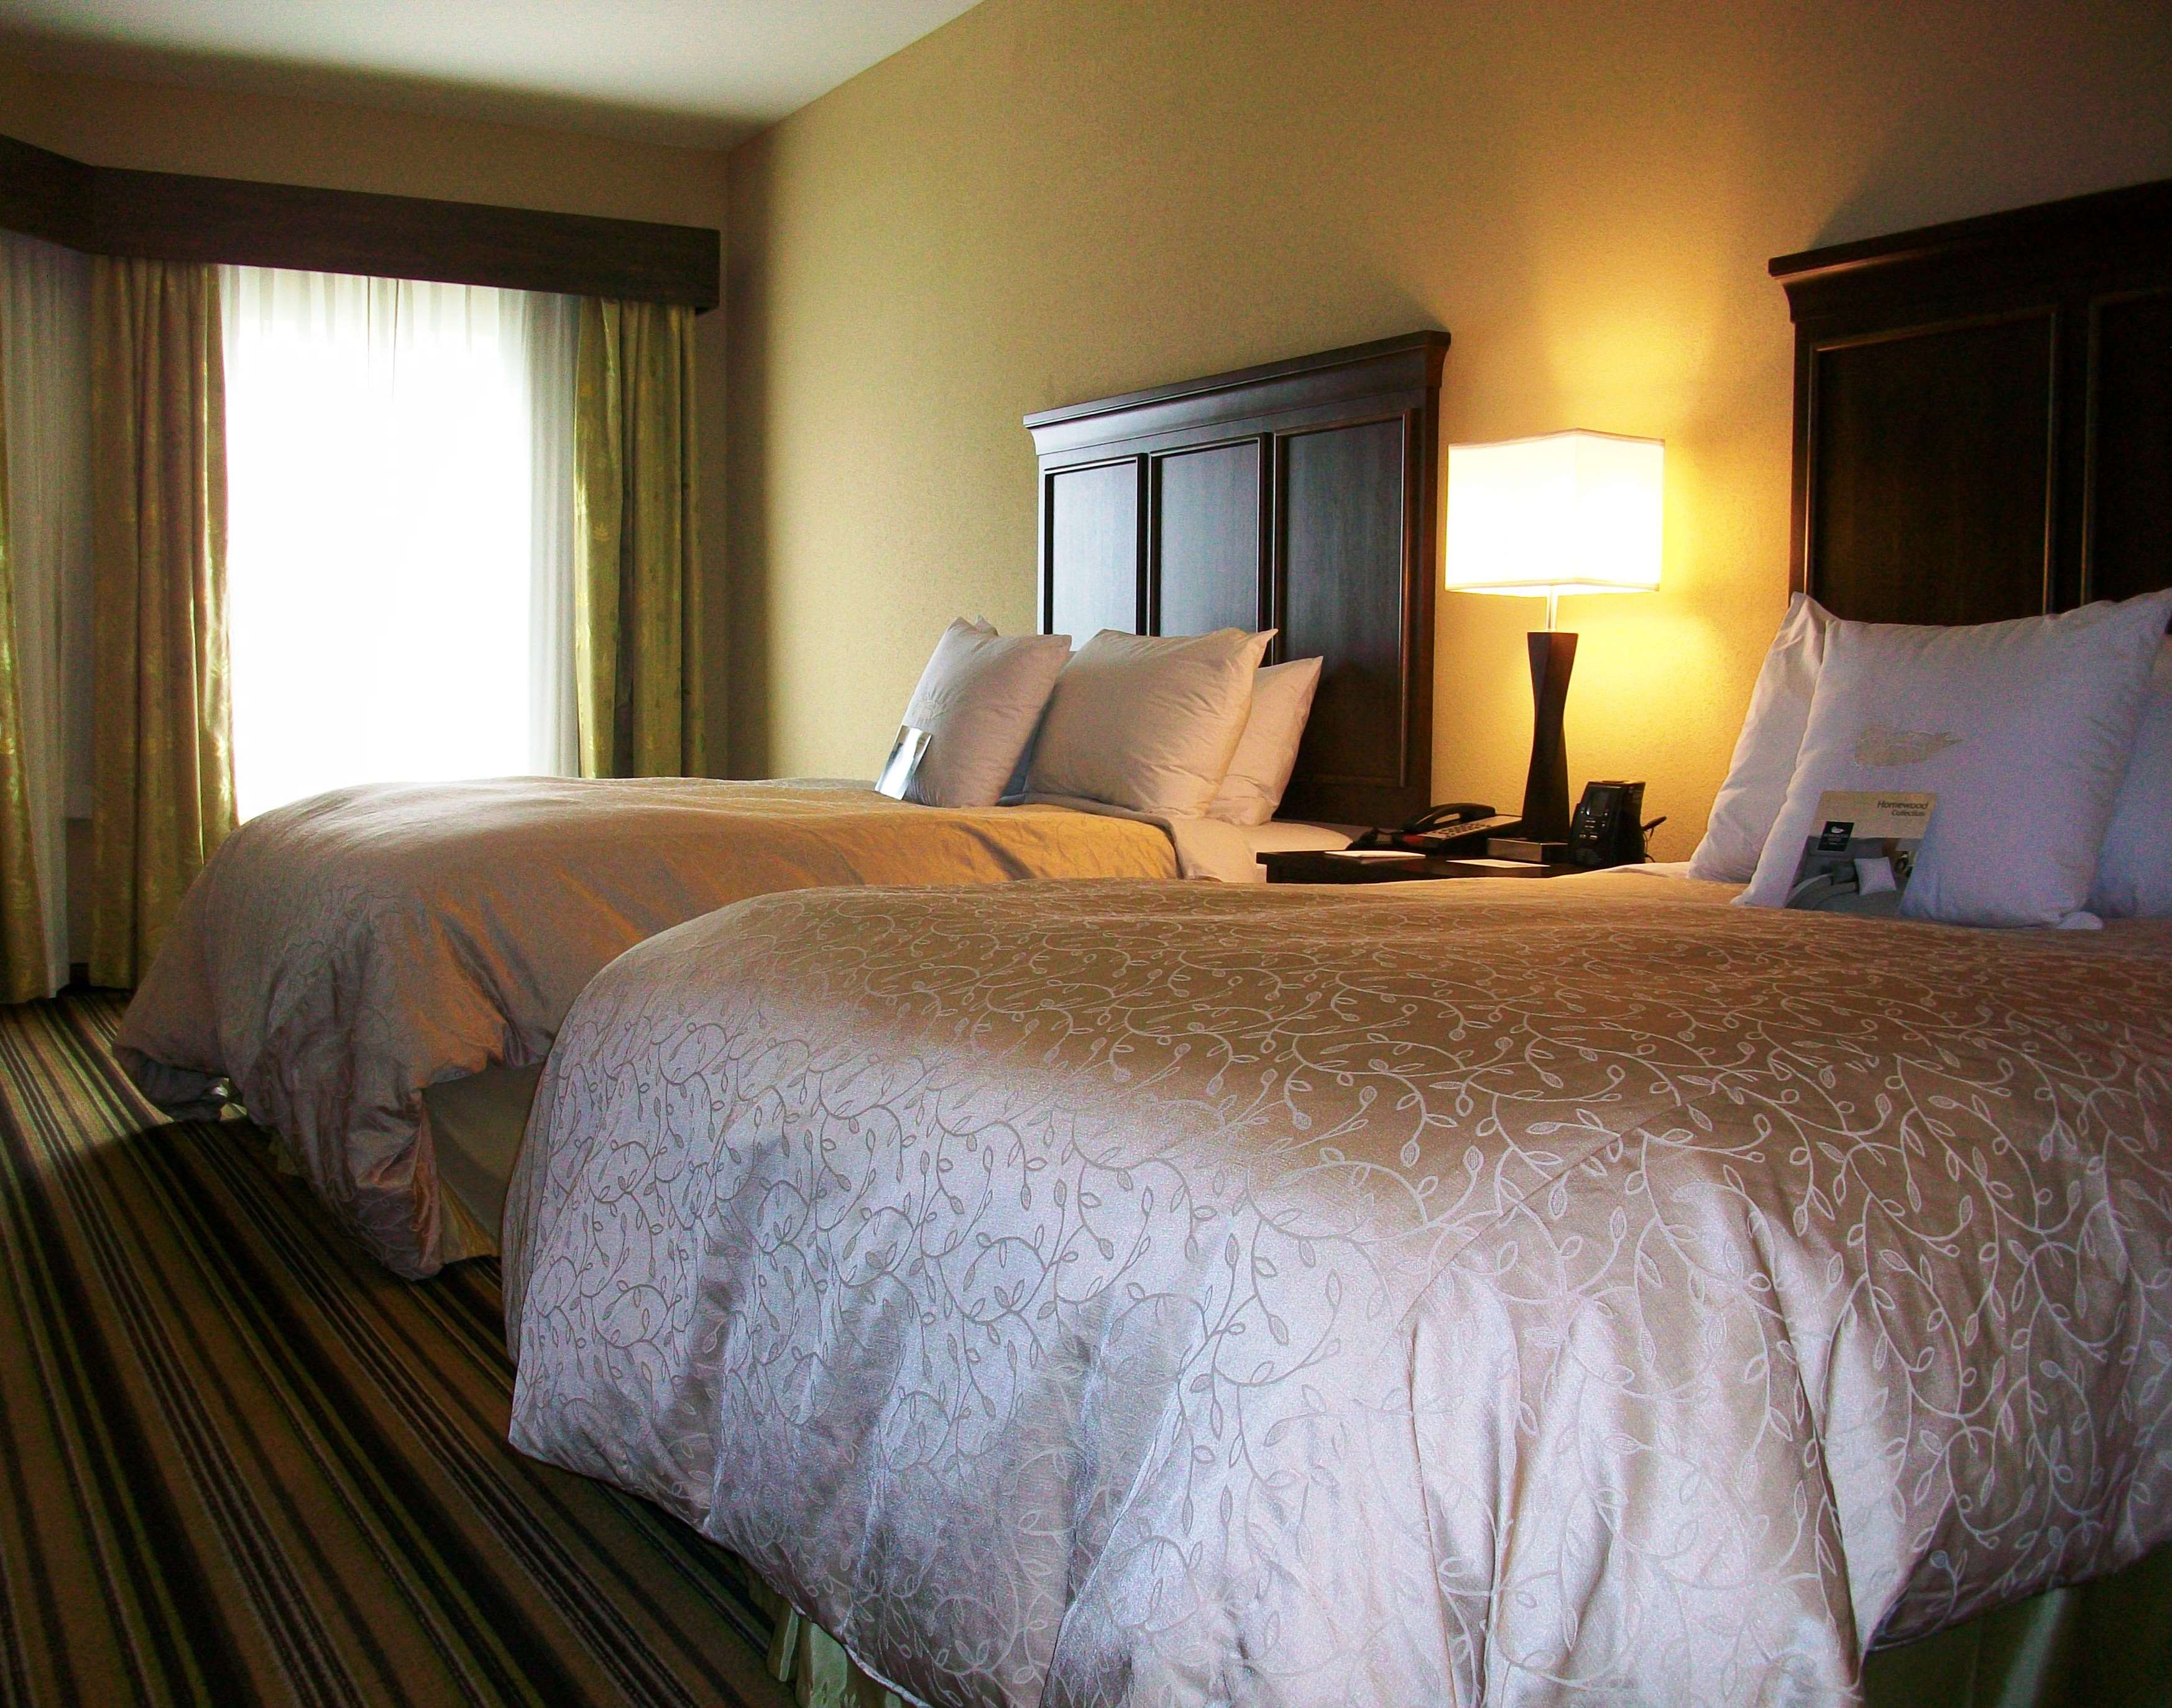 Homewood Suites by Hilton Charlotte/Ayrsley, NC image 11